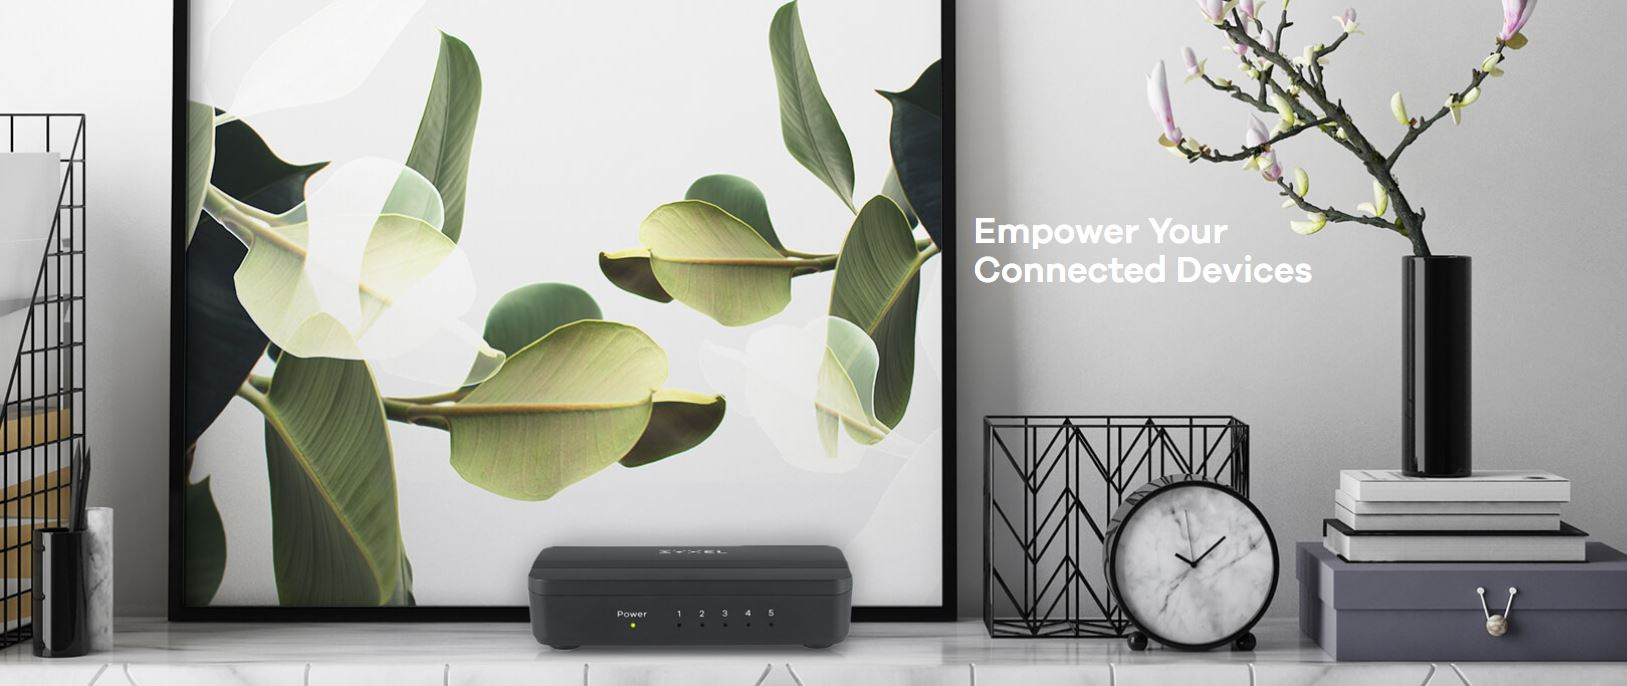 Zyxel GS-105S v2 5-Port Desktop Gigabit Ethernet Media Switch